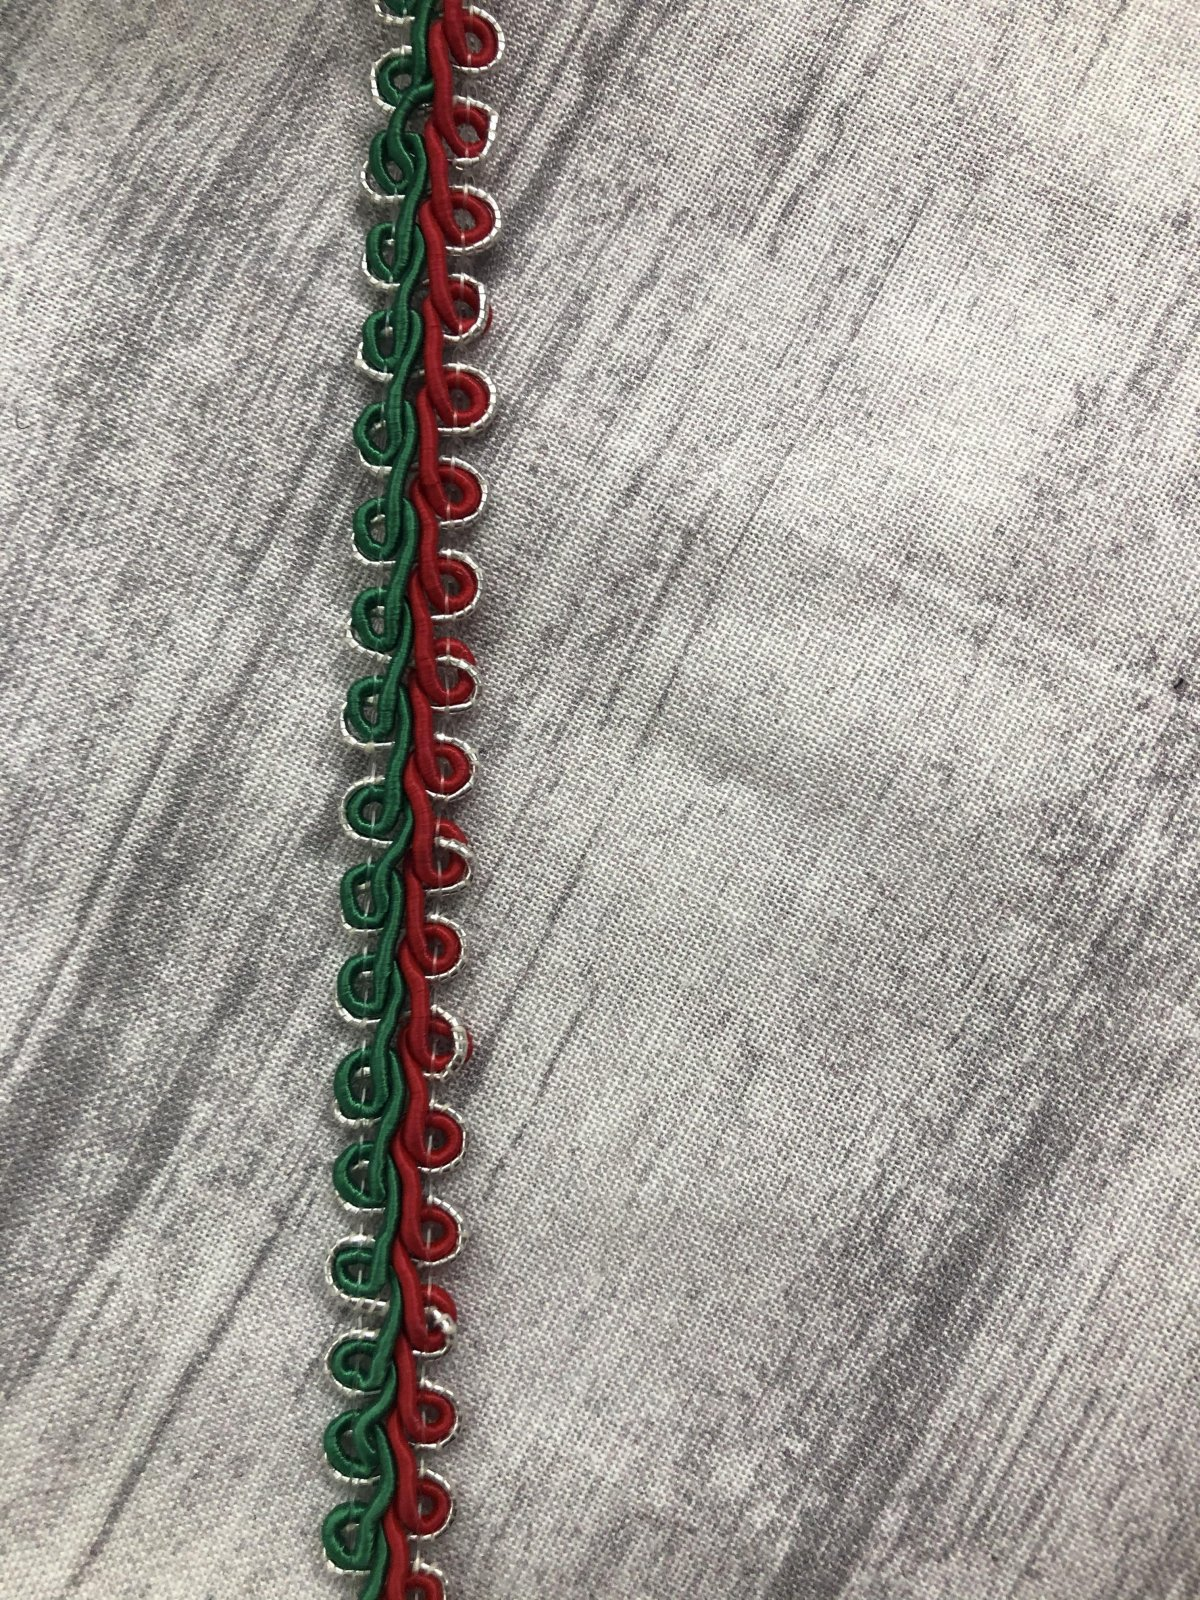 3/8 Chinese Gimp Trim Red Green And Metallic Silver 40%Rayon/40%Cotton/20%Metallic 1289-010